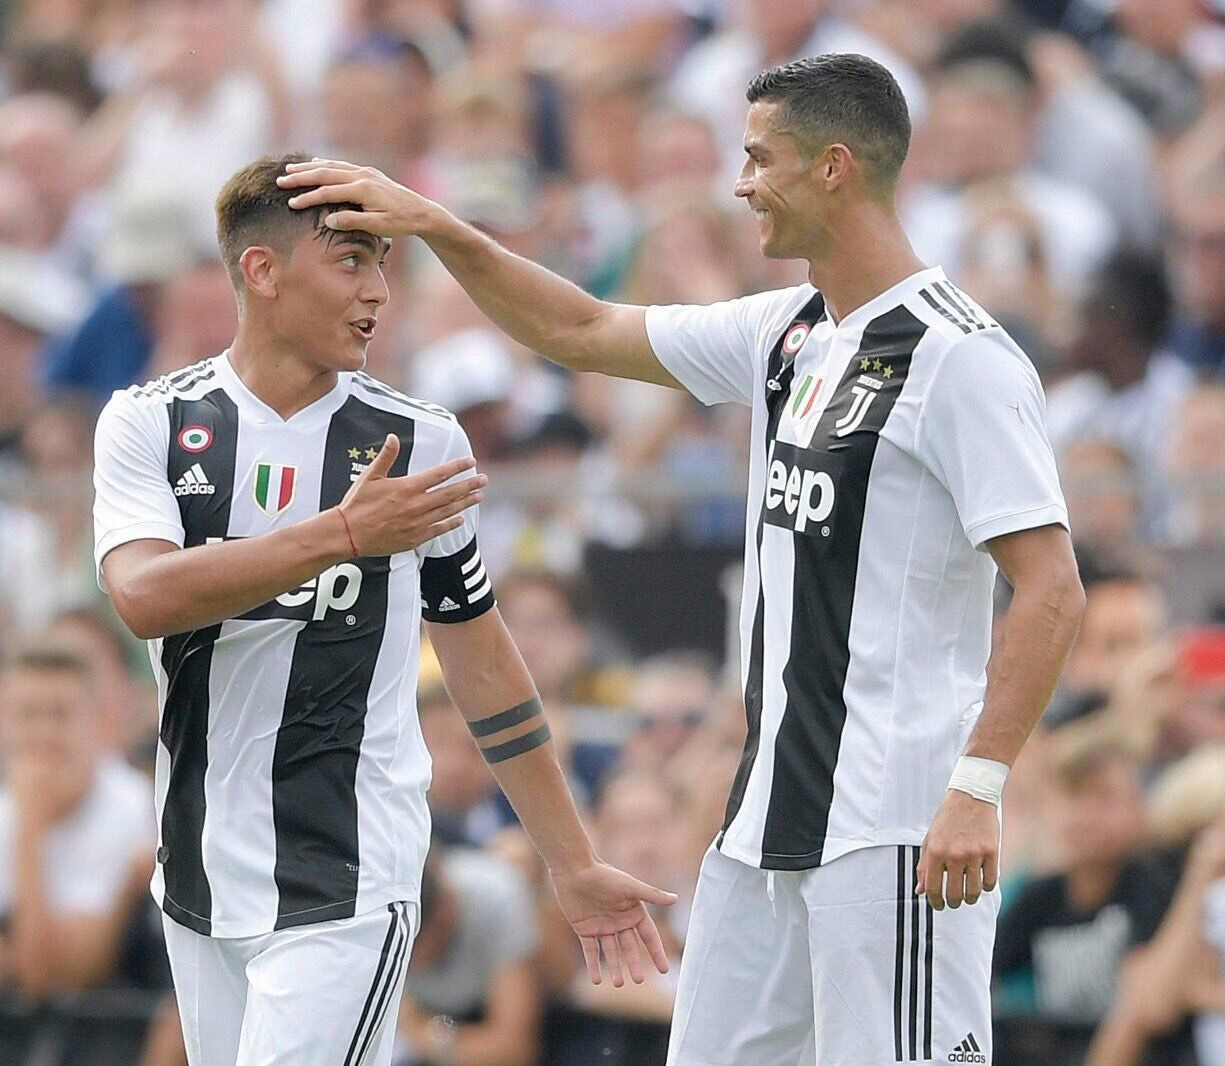 Dybala Juventus Cr7 Awww I Love This Pic Cytiedybala